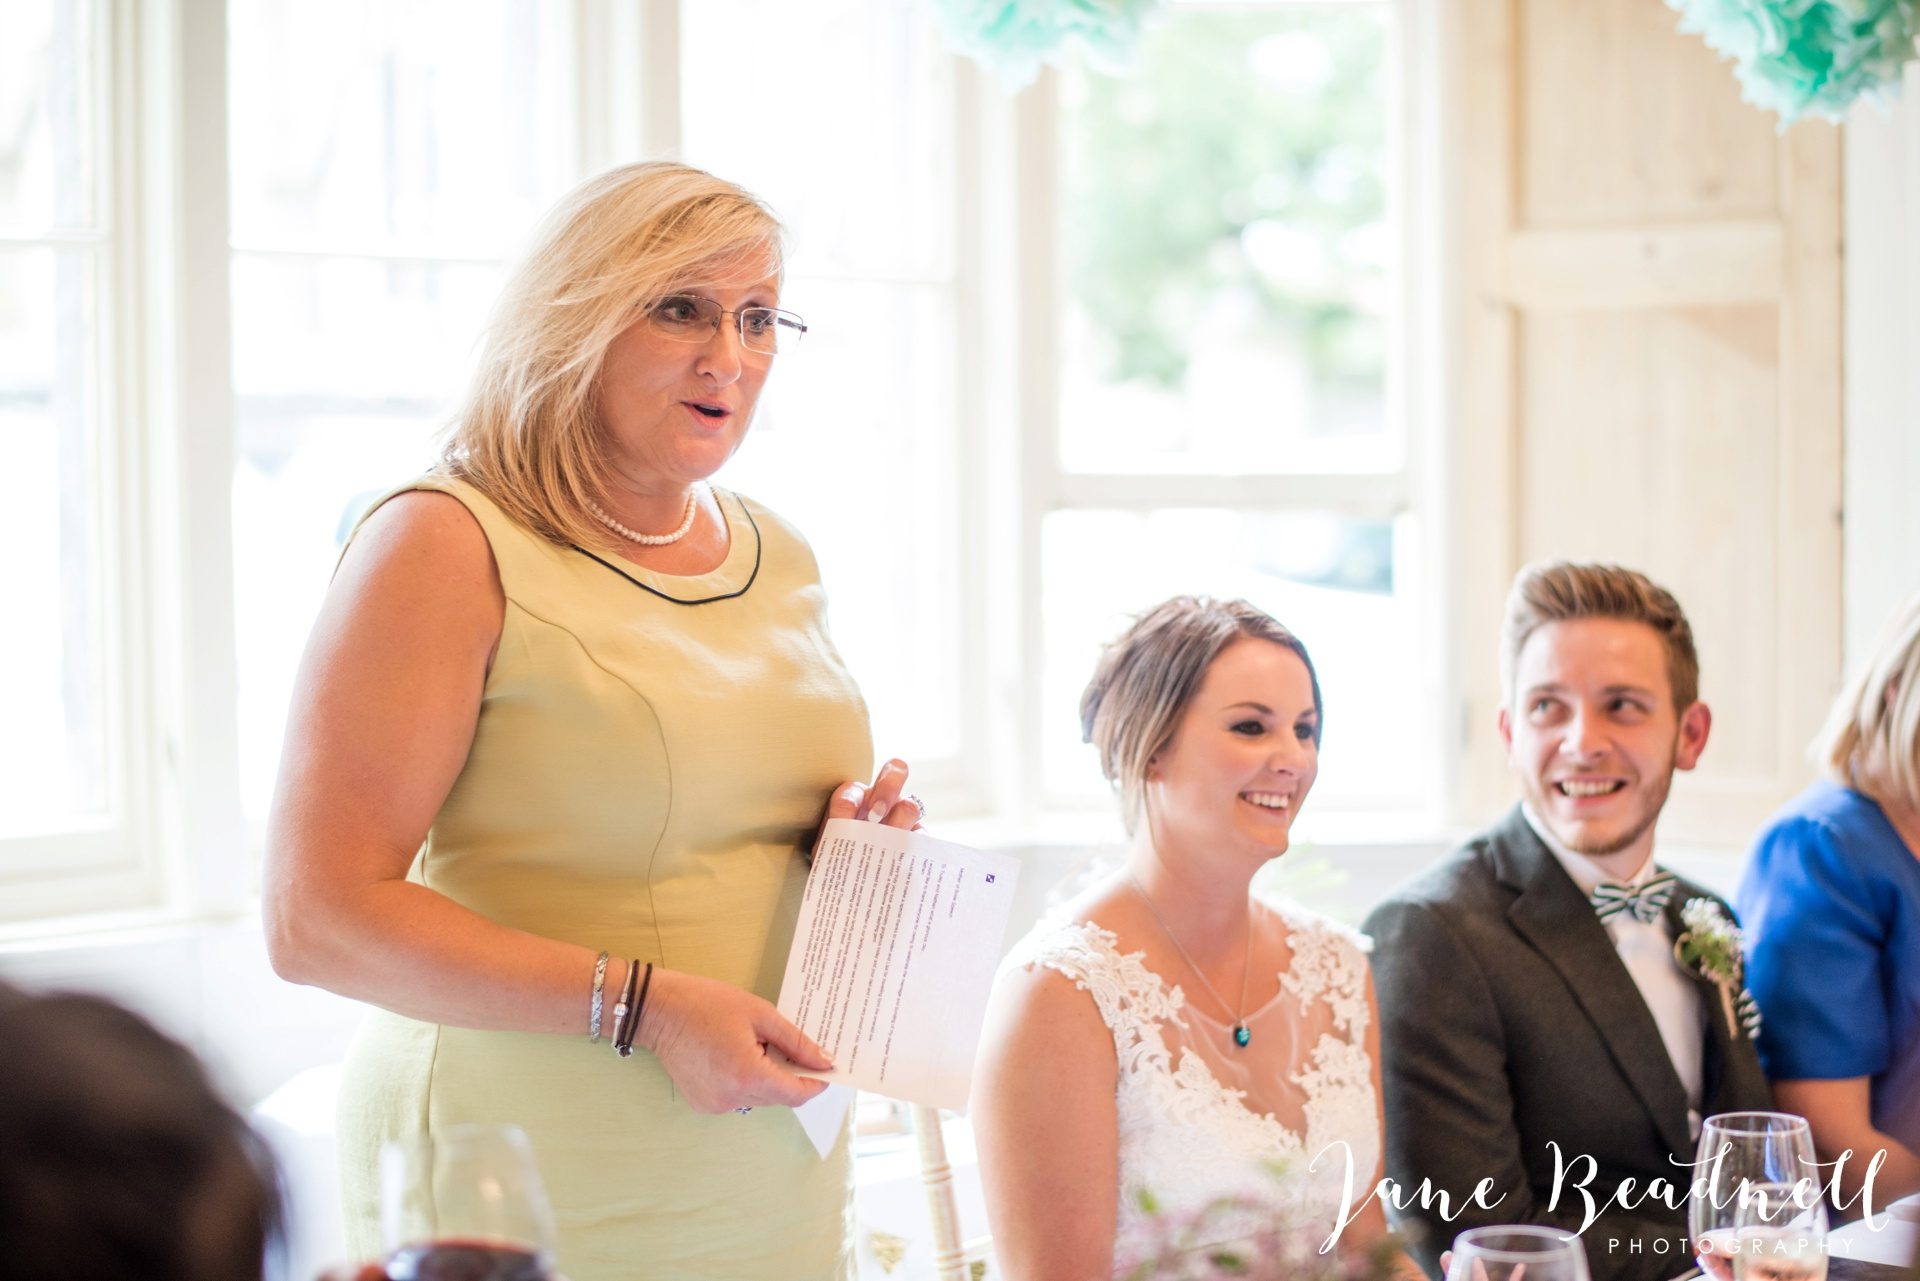 Jane Beadnell fine art wedding photographer The Old Deanery Ripon_0059